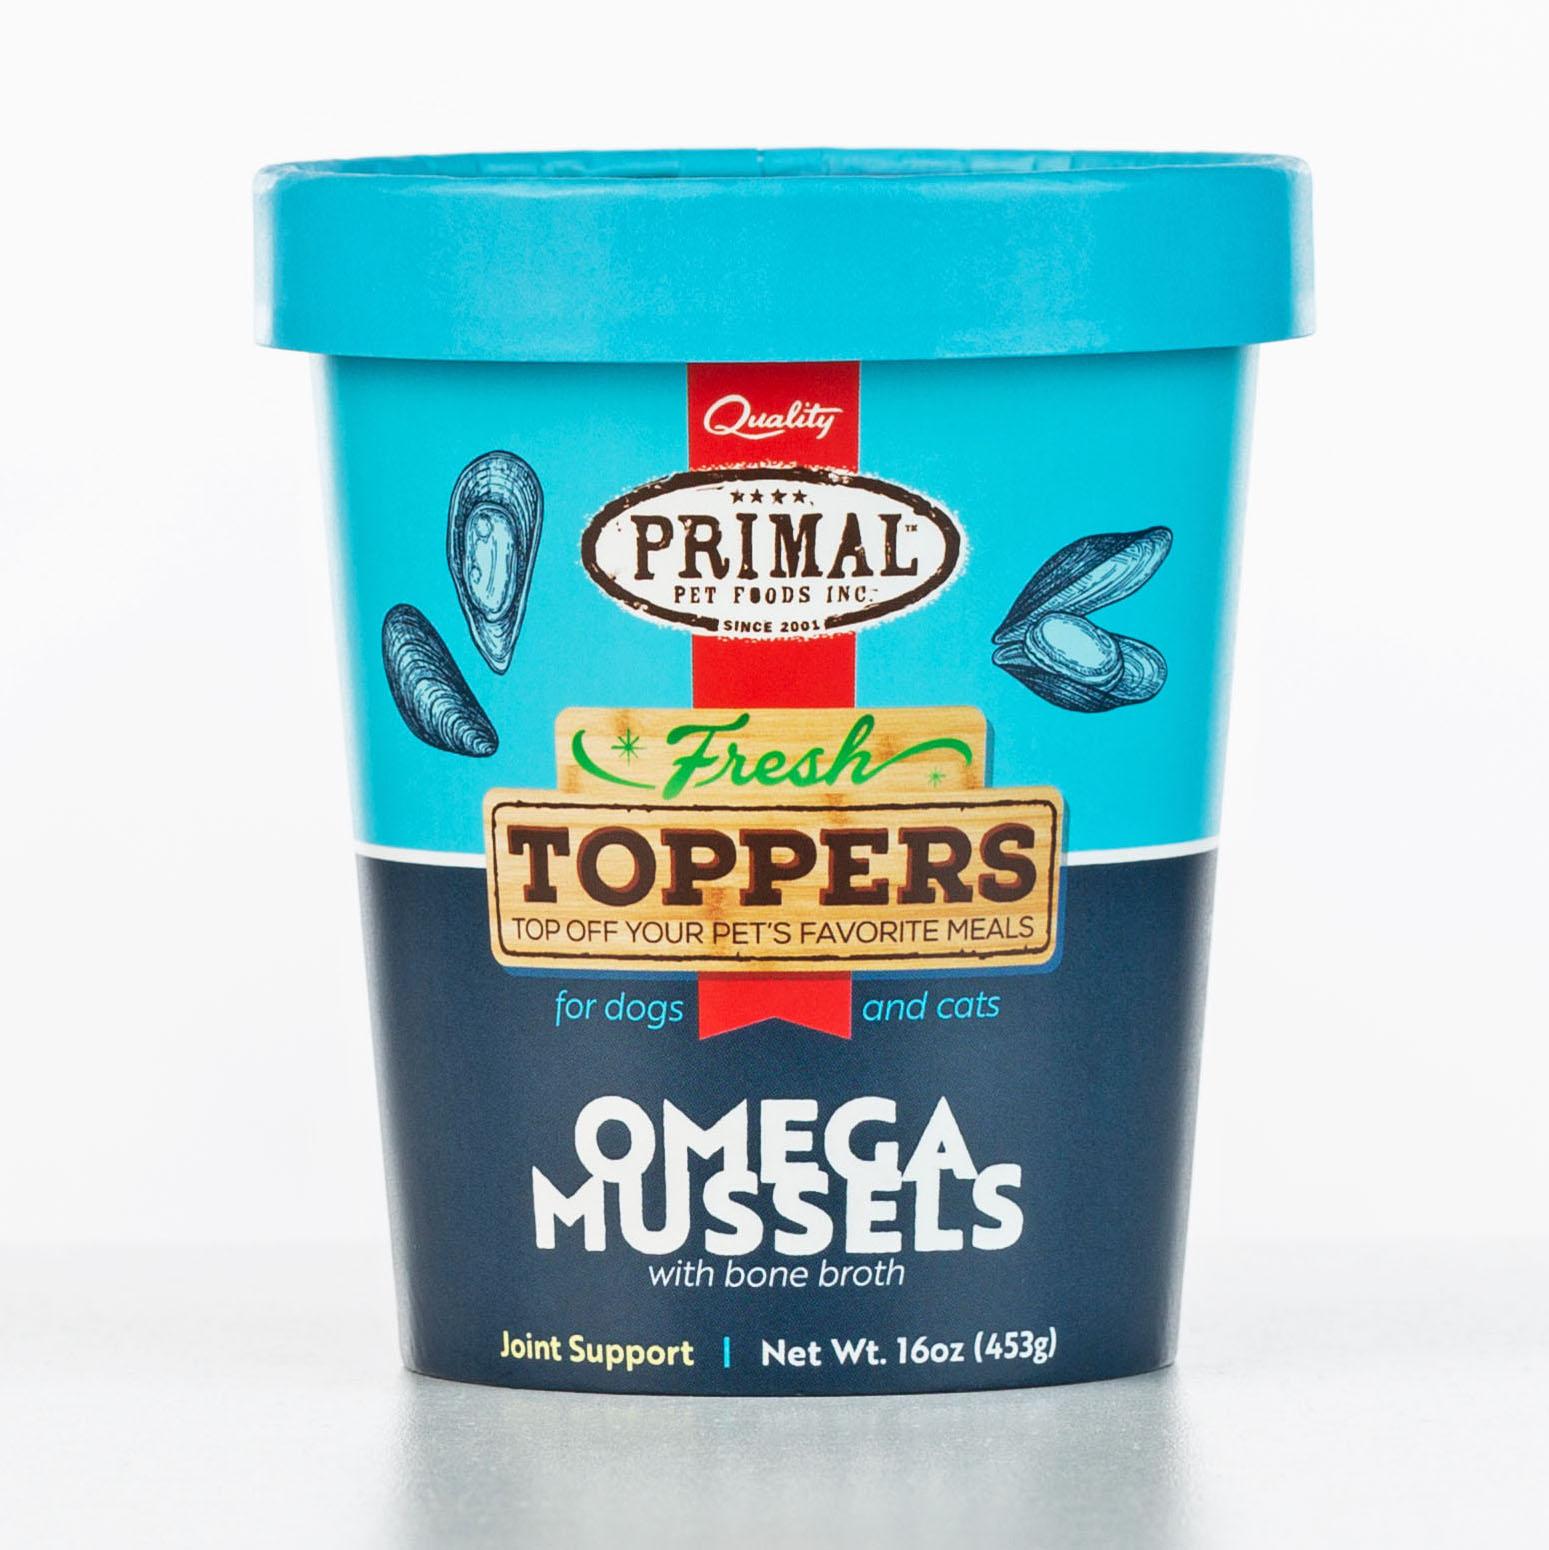 Primal Fresh Toppers Omega Mussels, Frozen Dog & Cat Food Topper, 16-oz